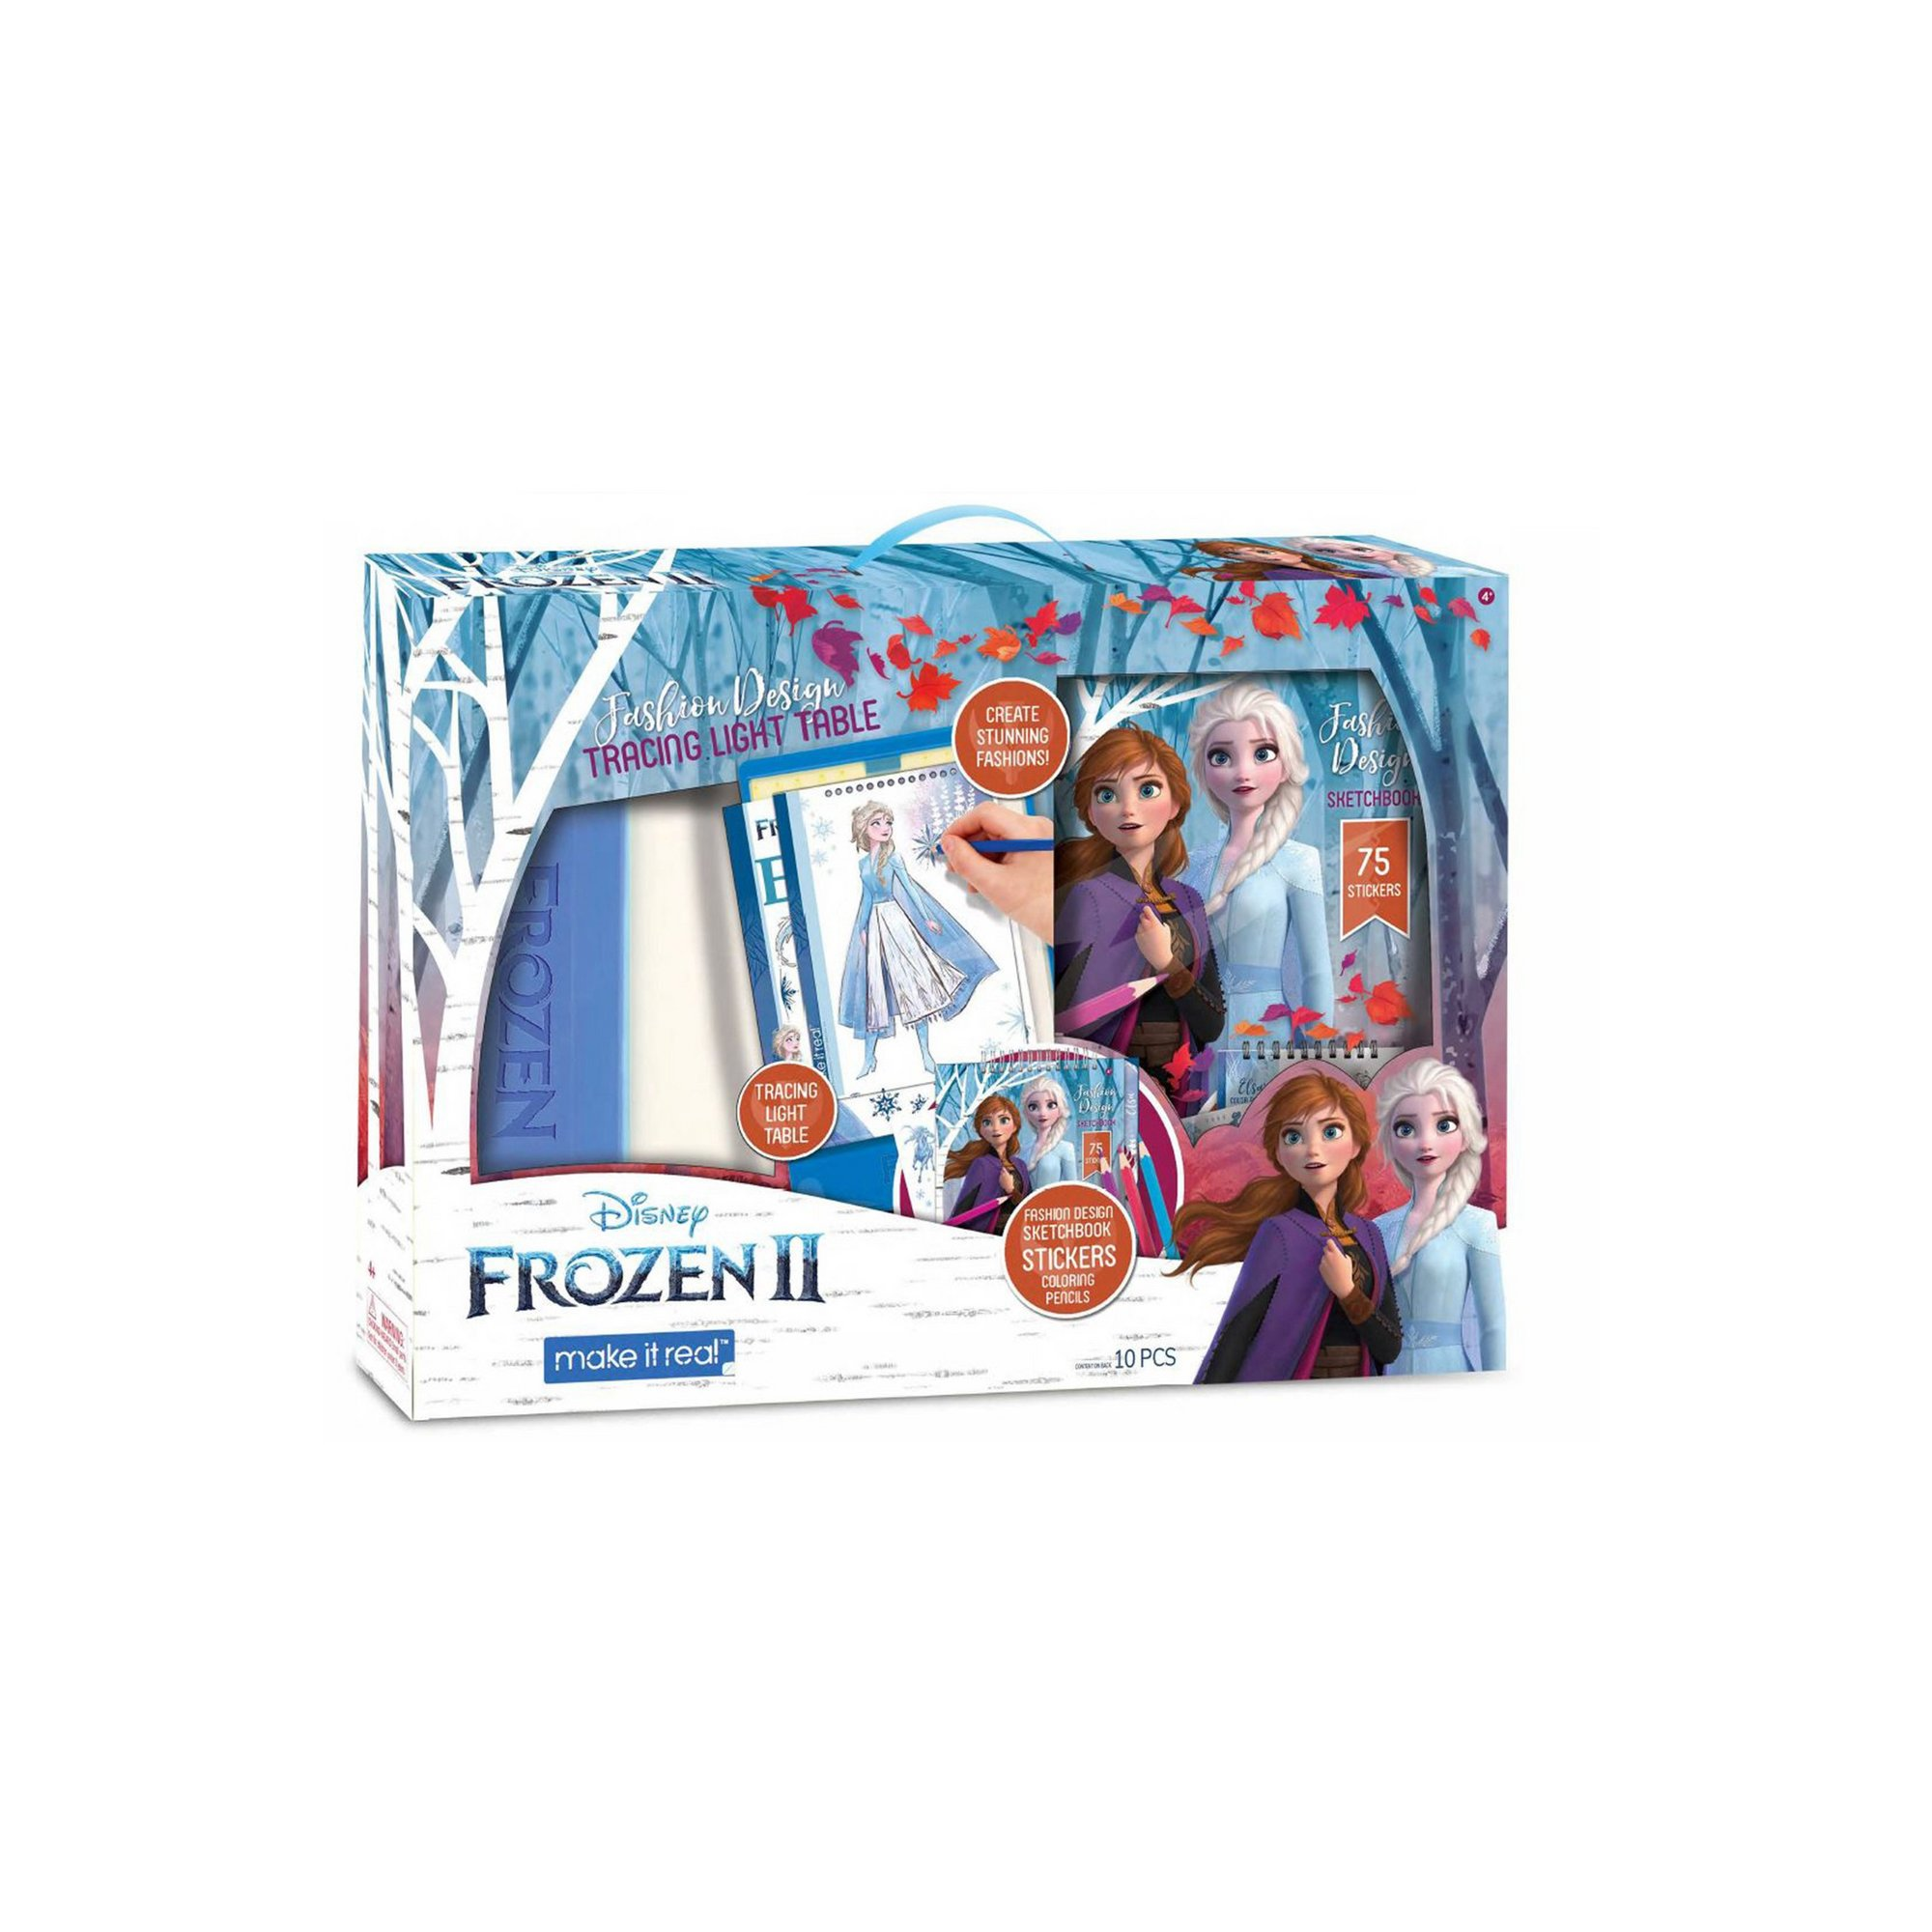 Image of Disney Frozen 2 Sketchbook with Light Table